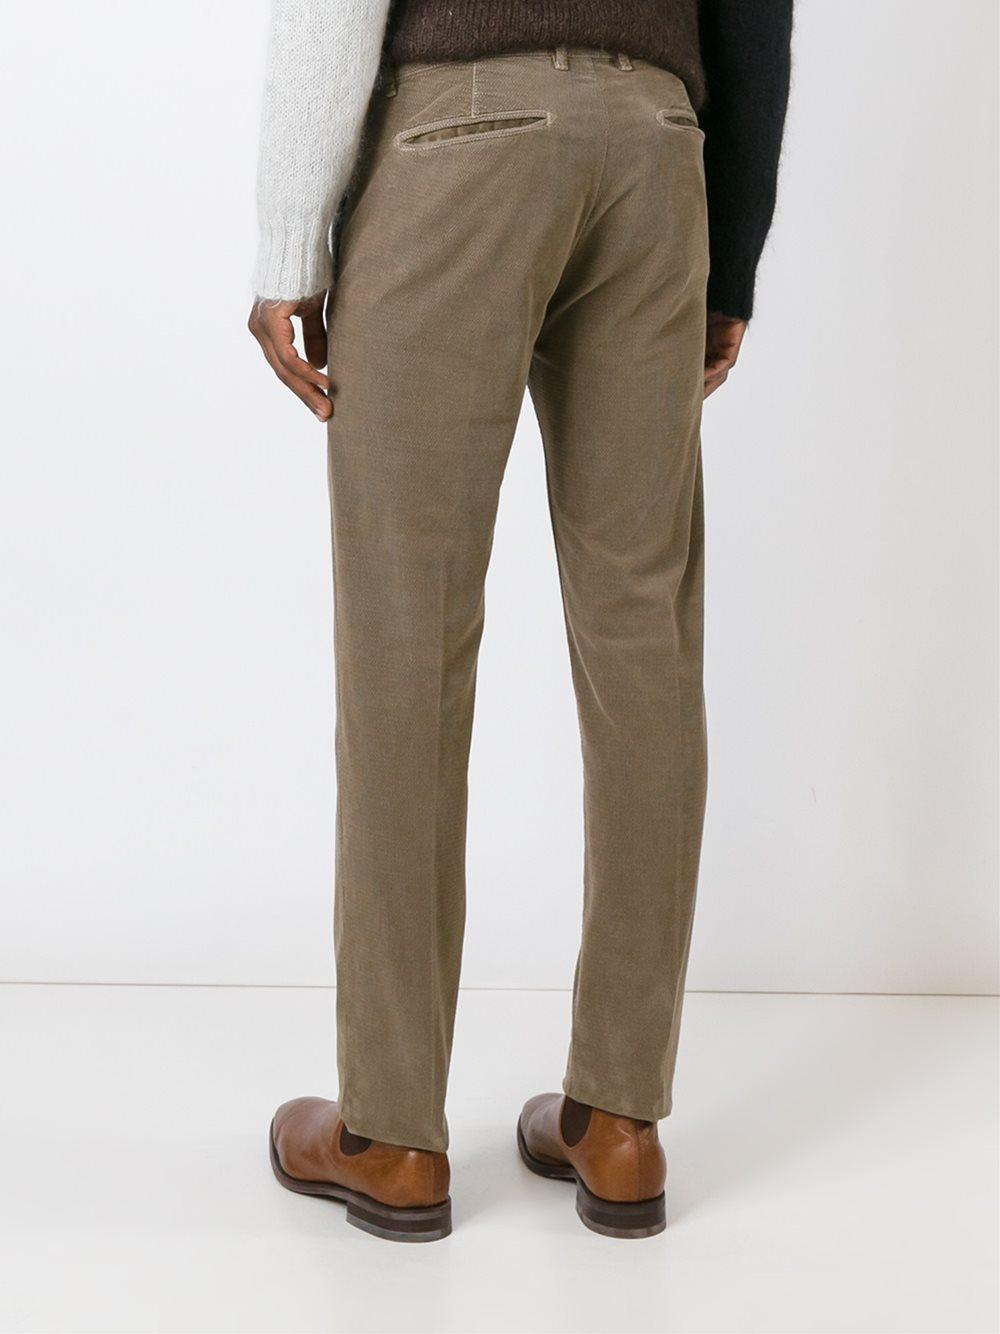 Massimo Alba Cotton 'winch' Trousers in Natural for Men